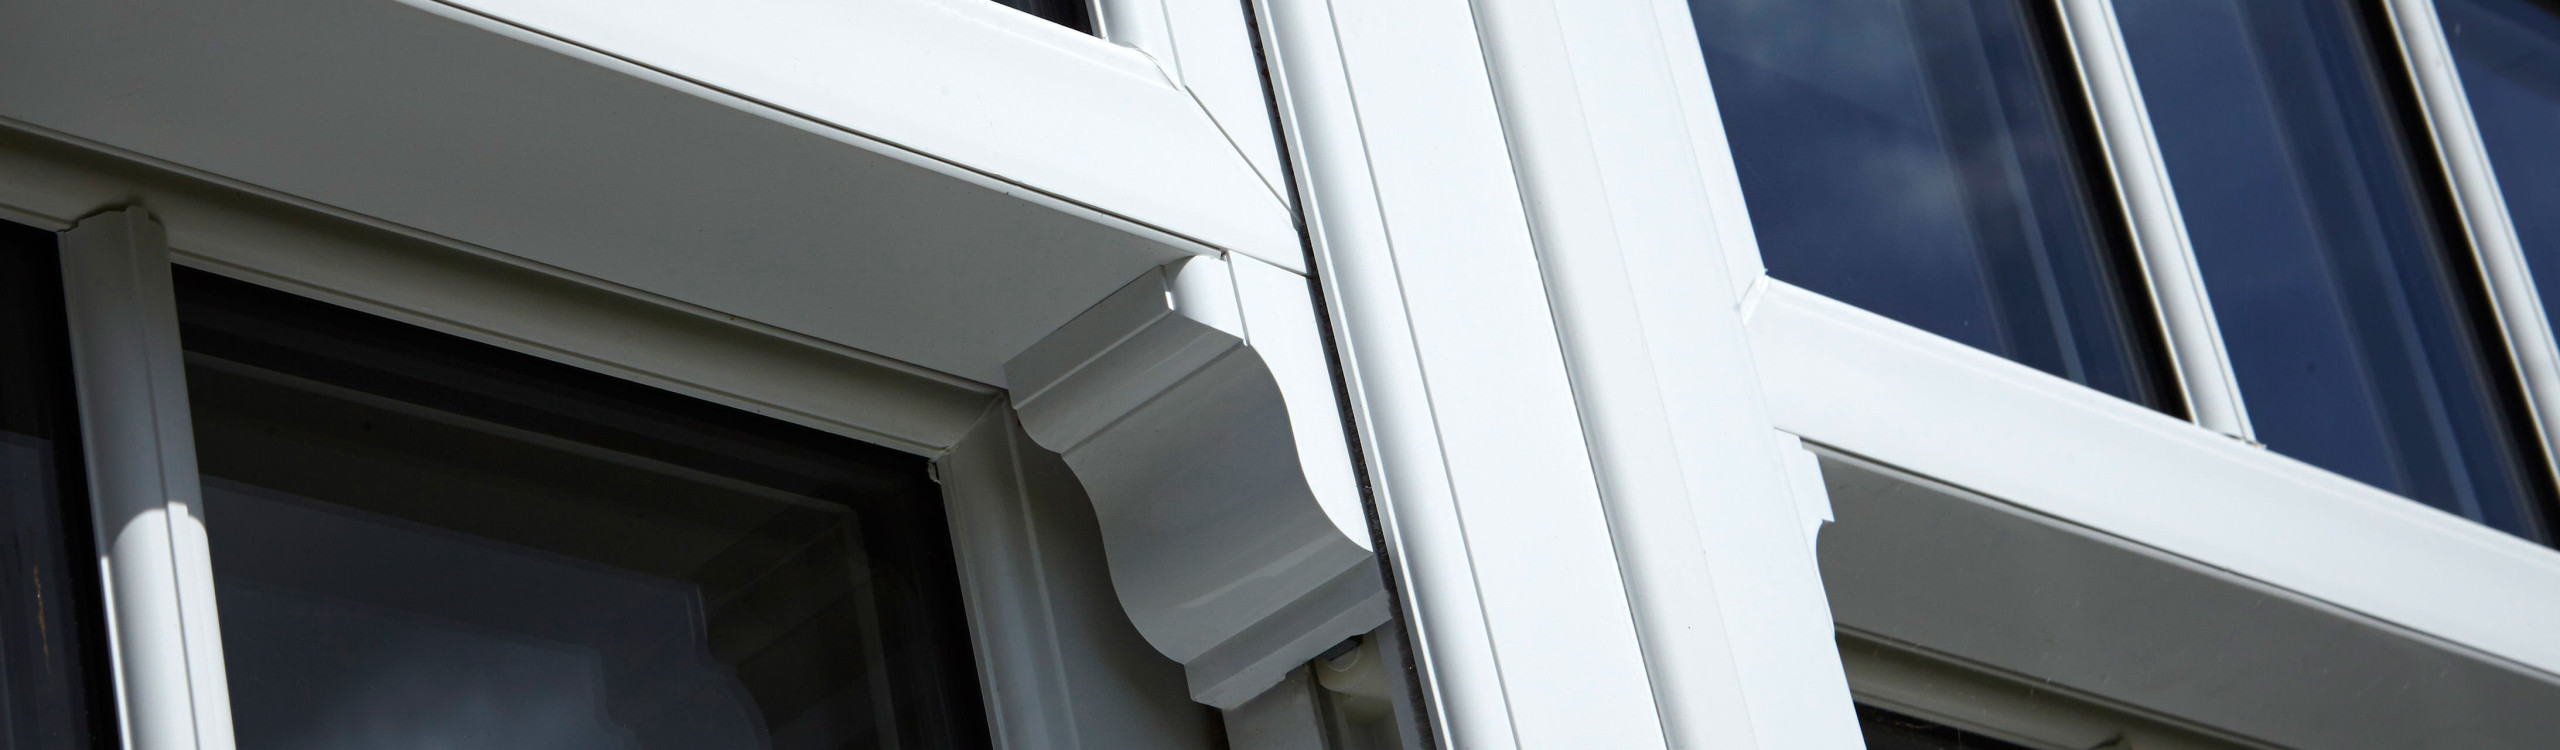 uPVC double glazing ramsgate